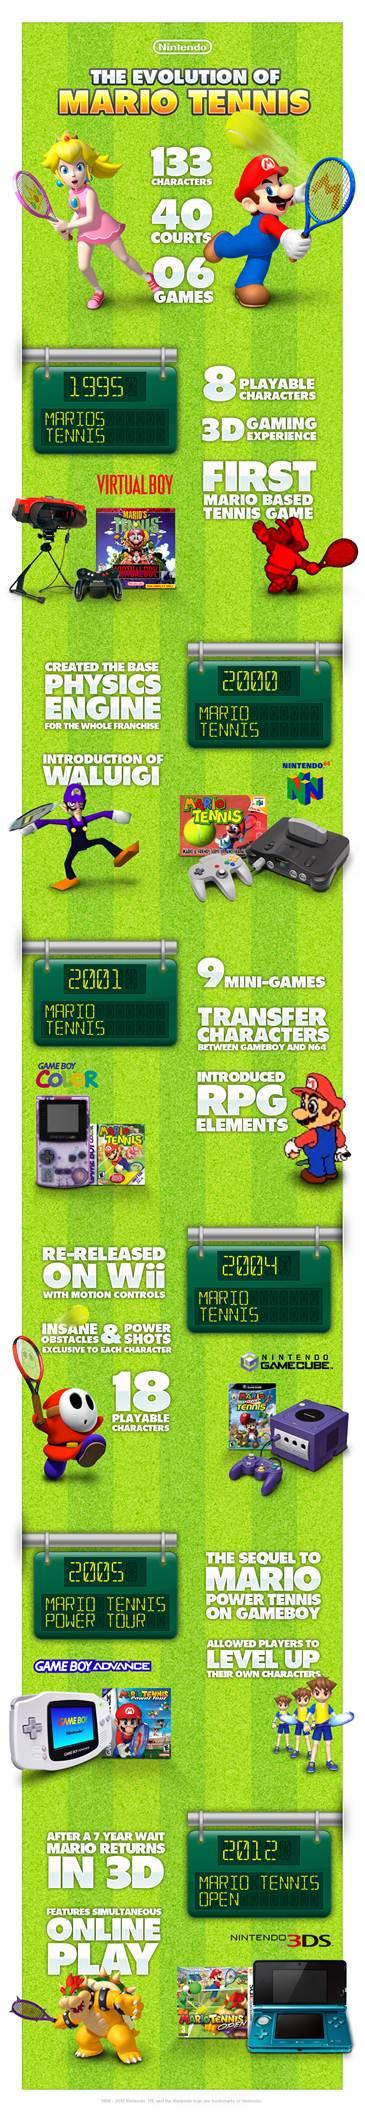 The-Evolution-Of-Mario-Tennis-infographic